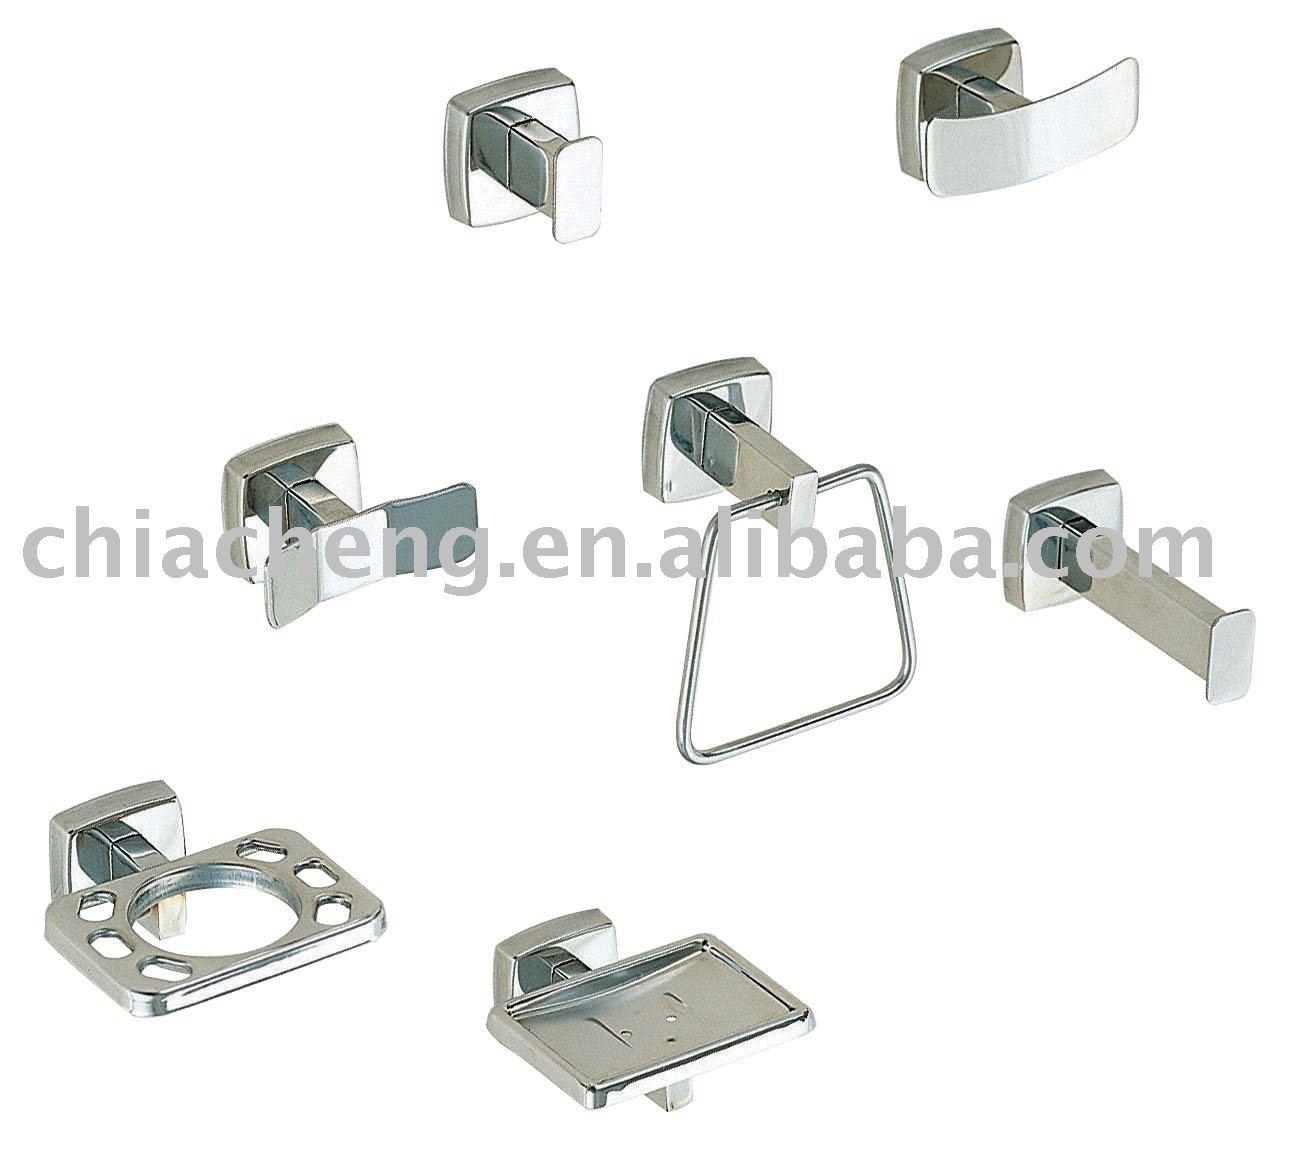 taiwan bathroom accessories, taiwan bathroom accessories